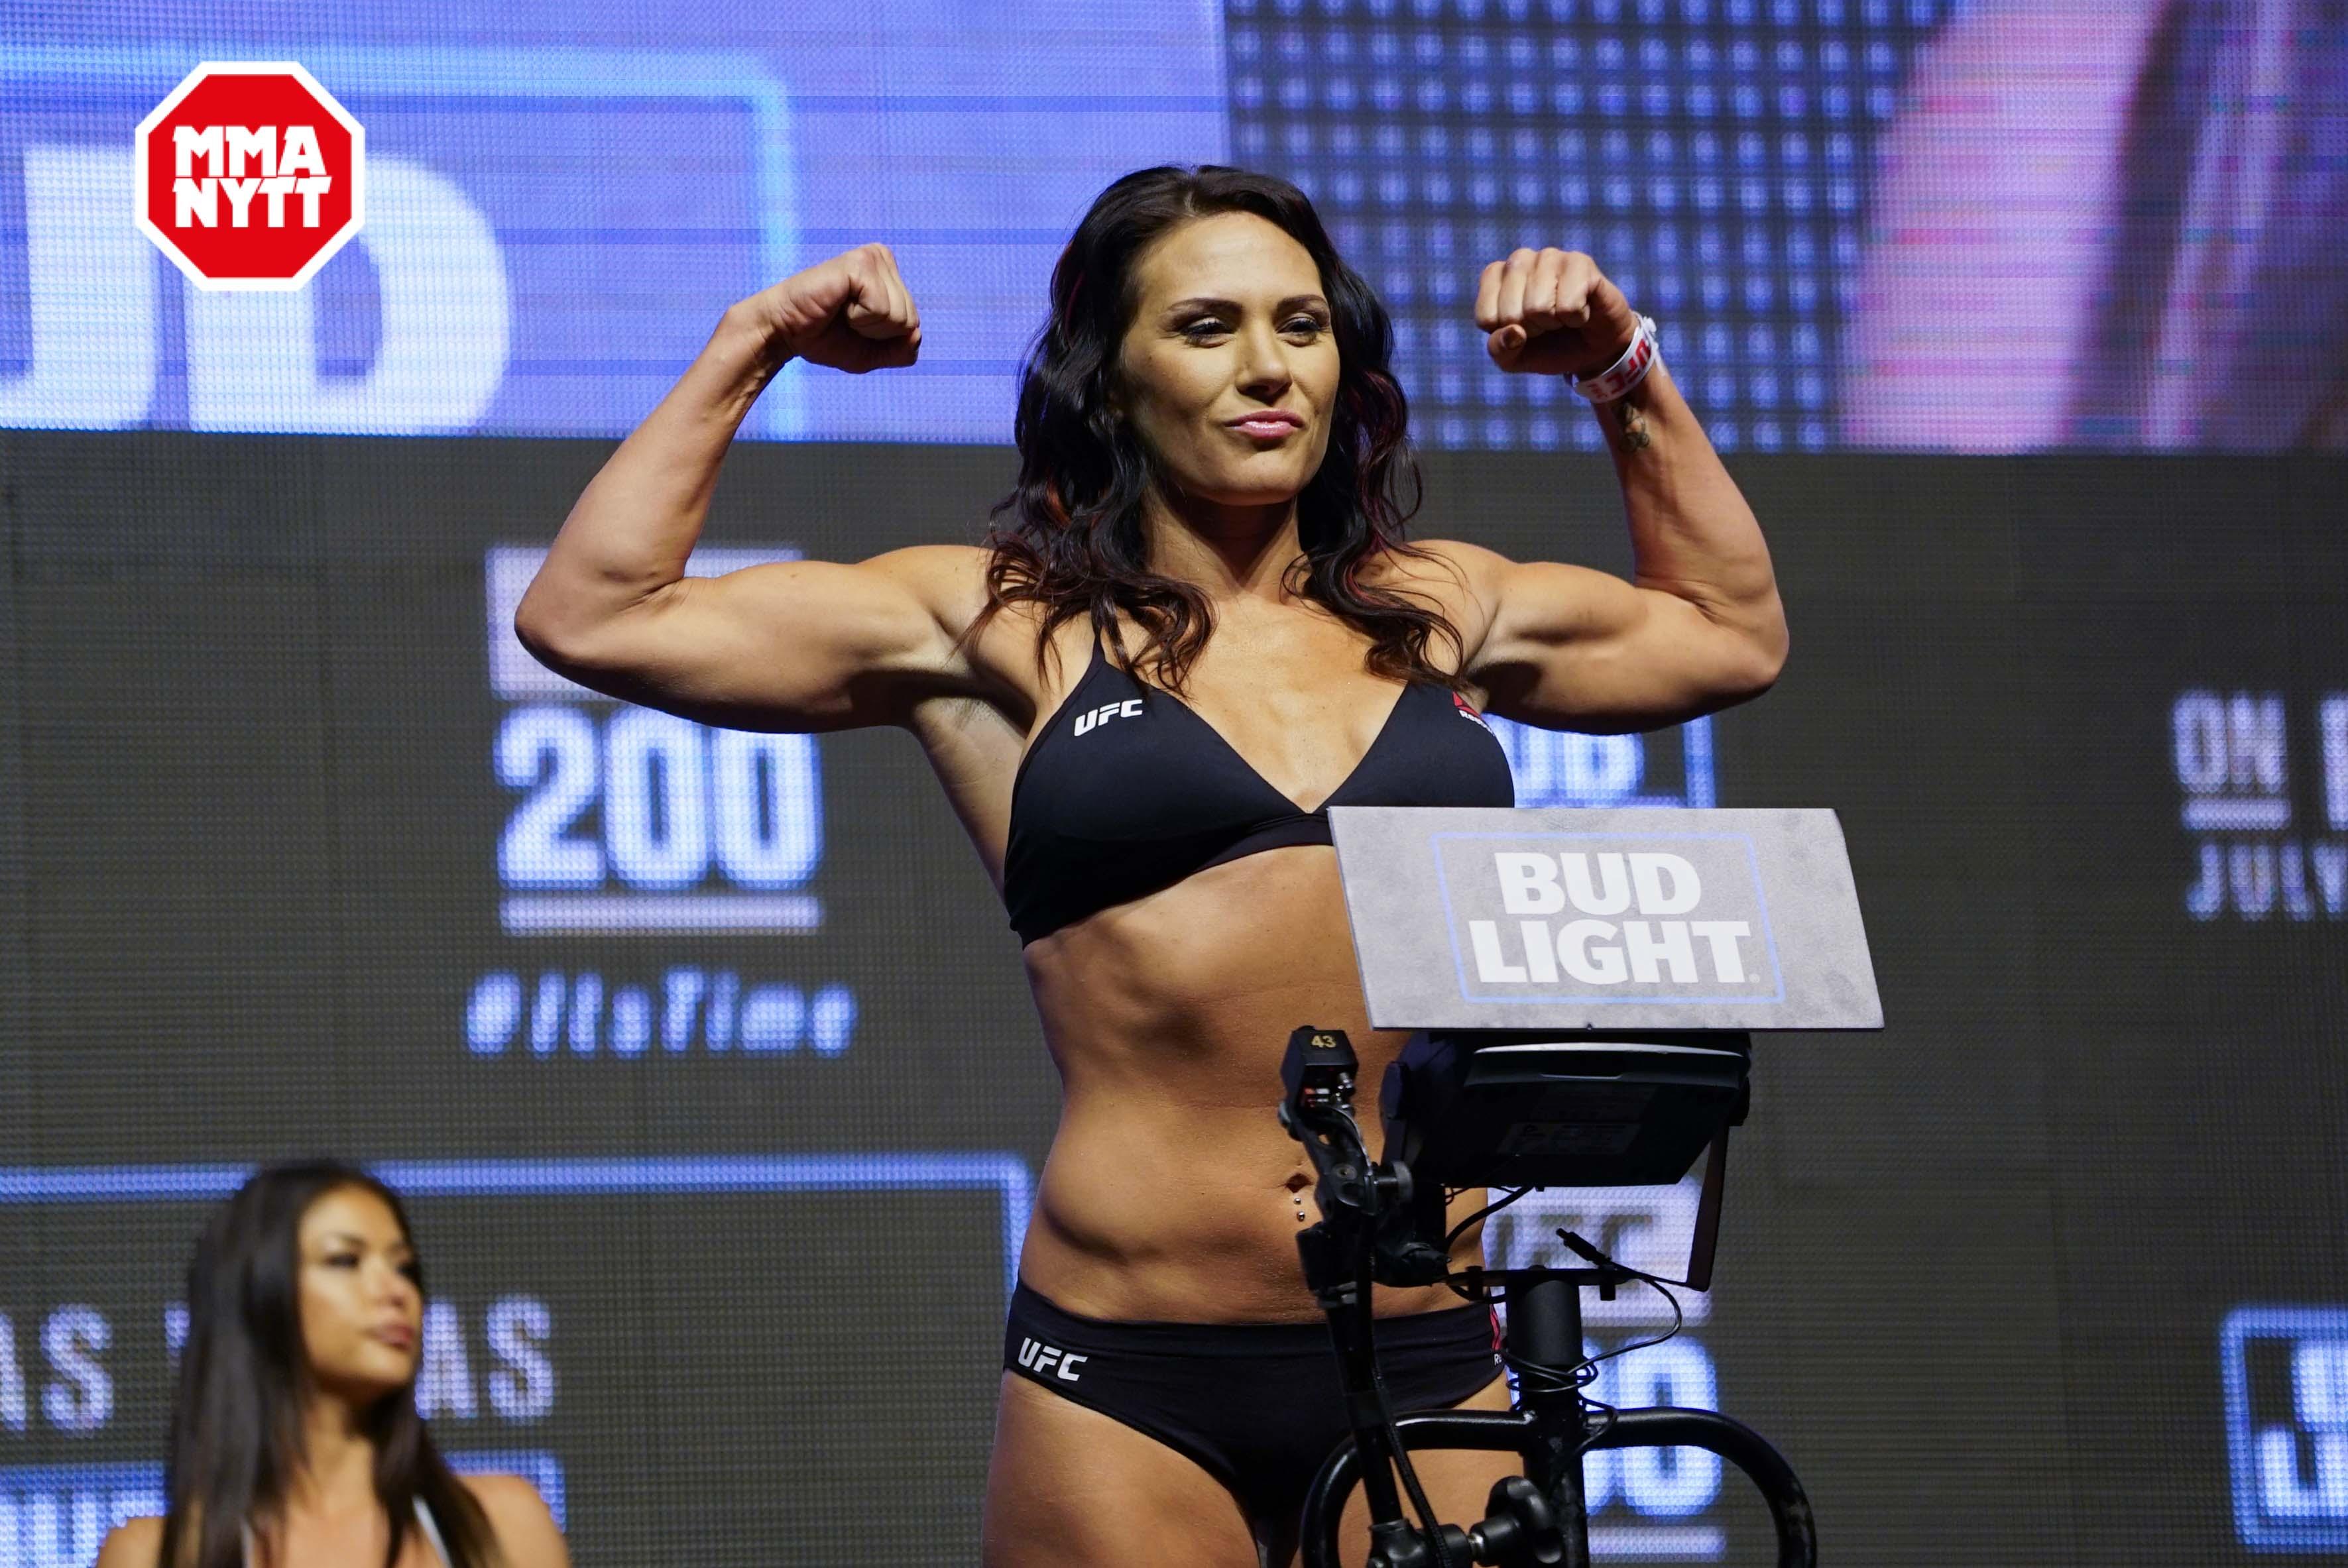 UFC 200 Las Vegas Weig...